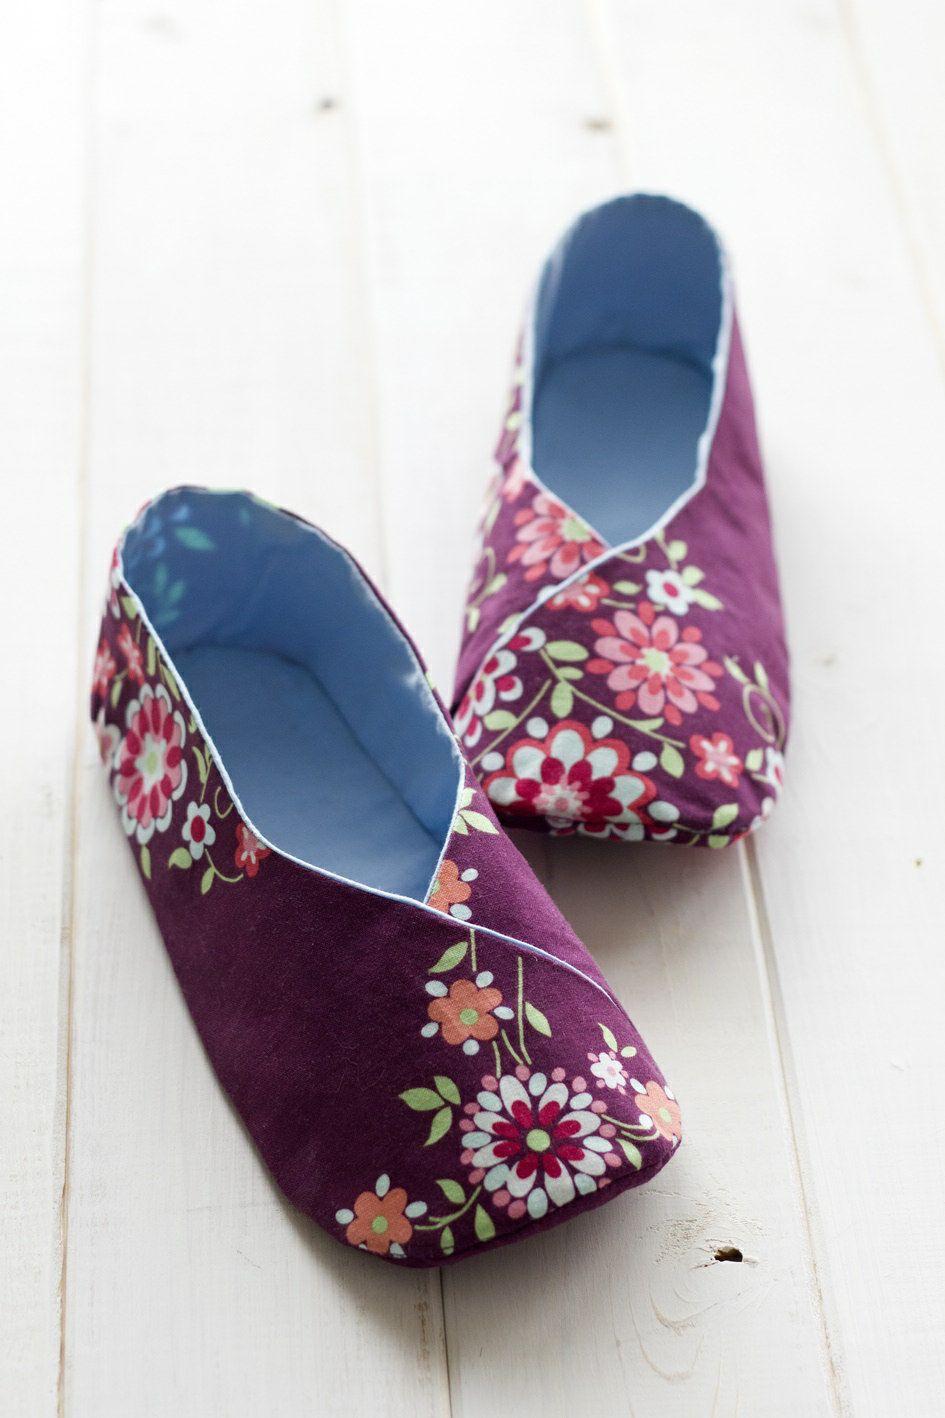 2373 zapatillas de andar por casa slippers labores - Botas andar por casa ...